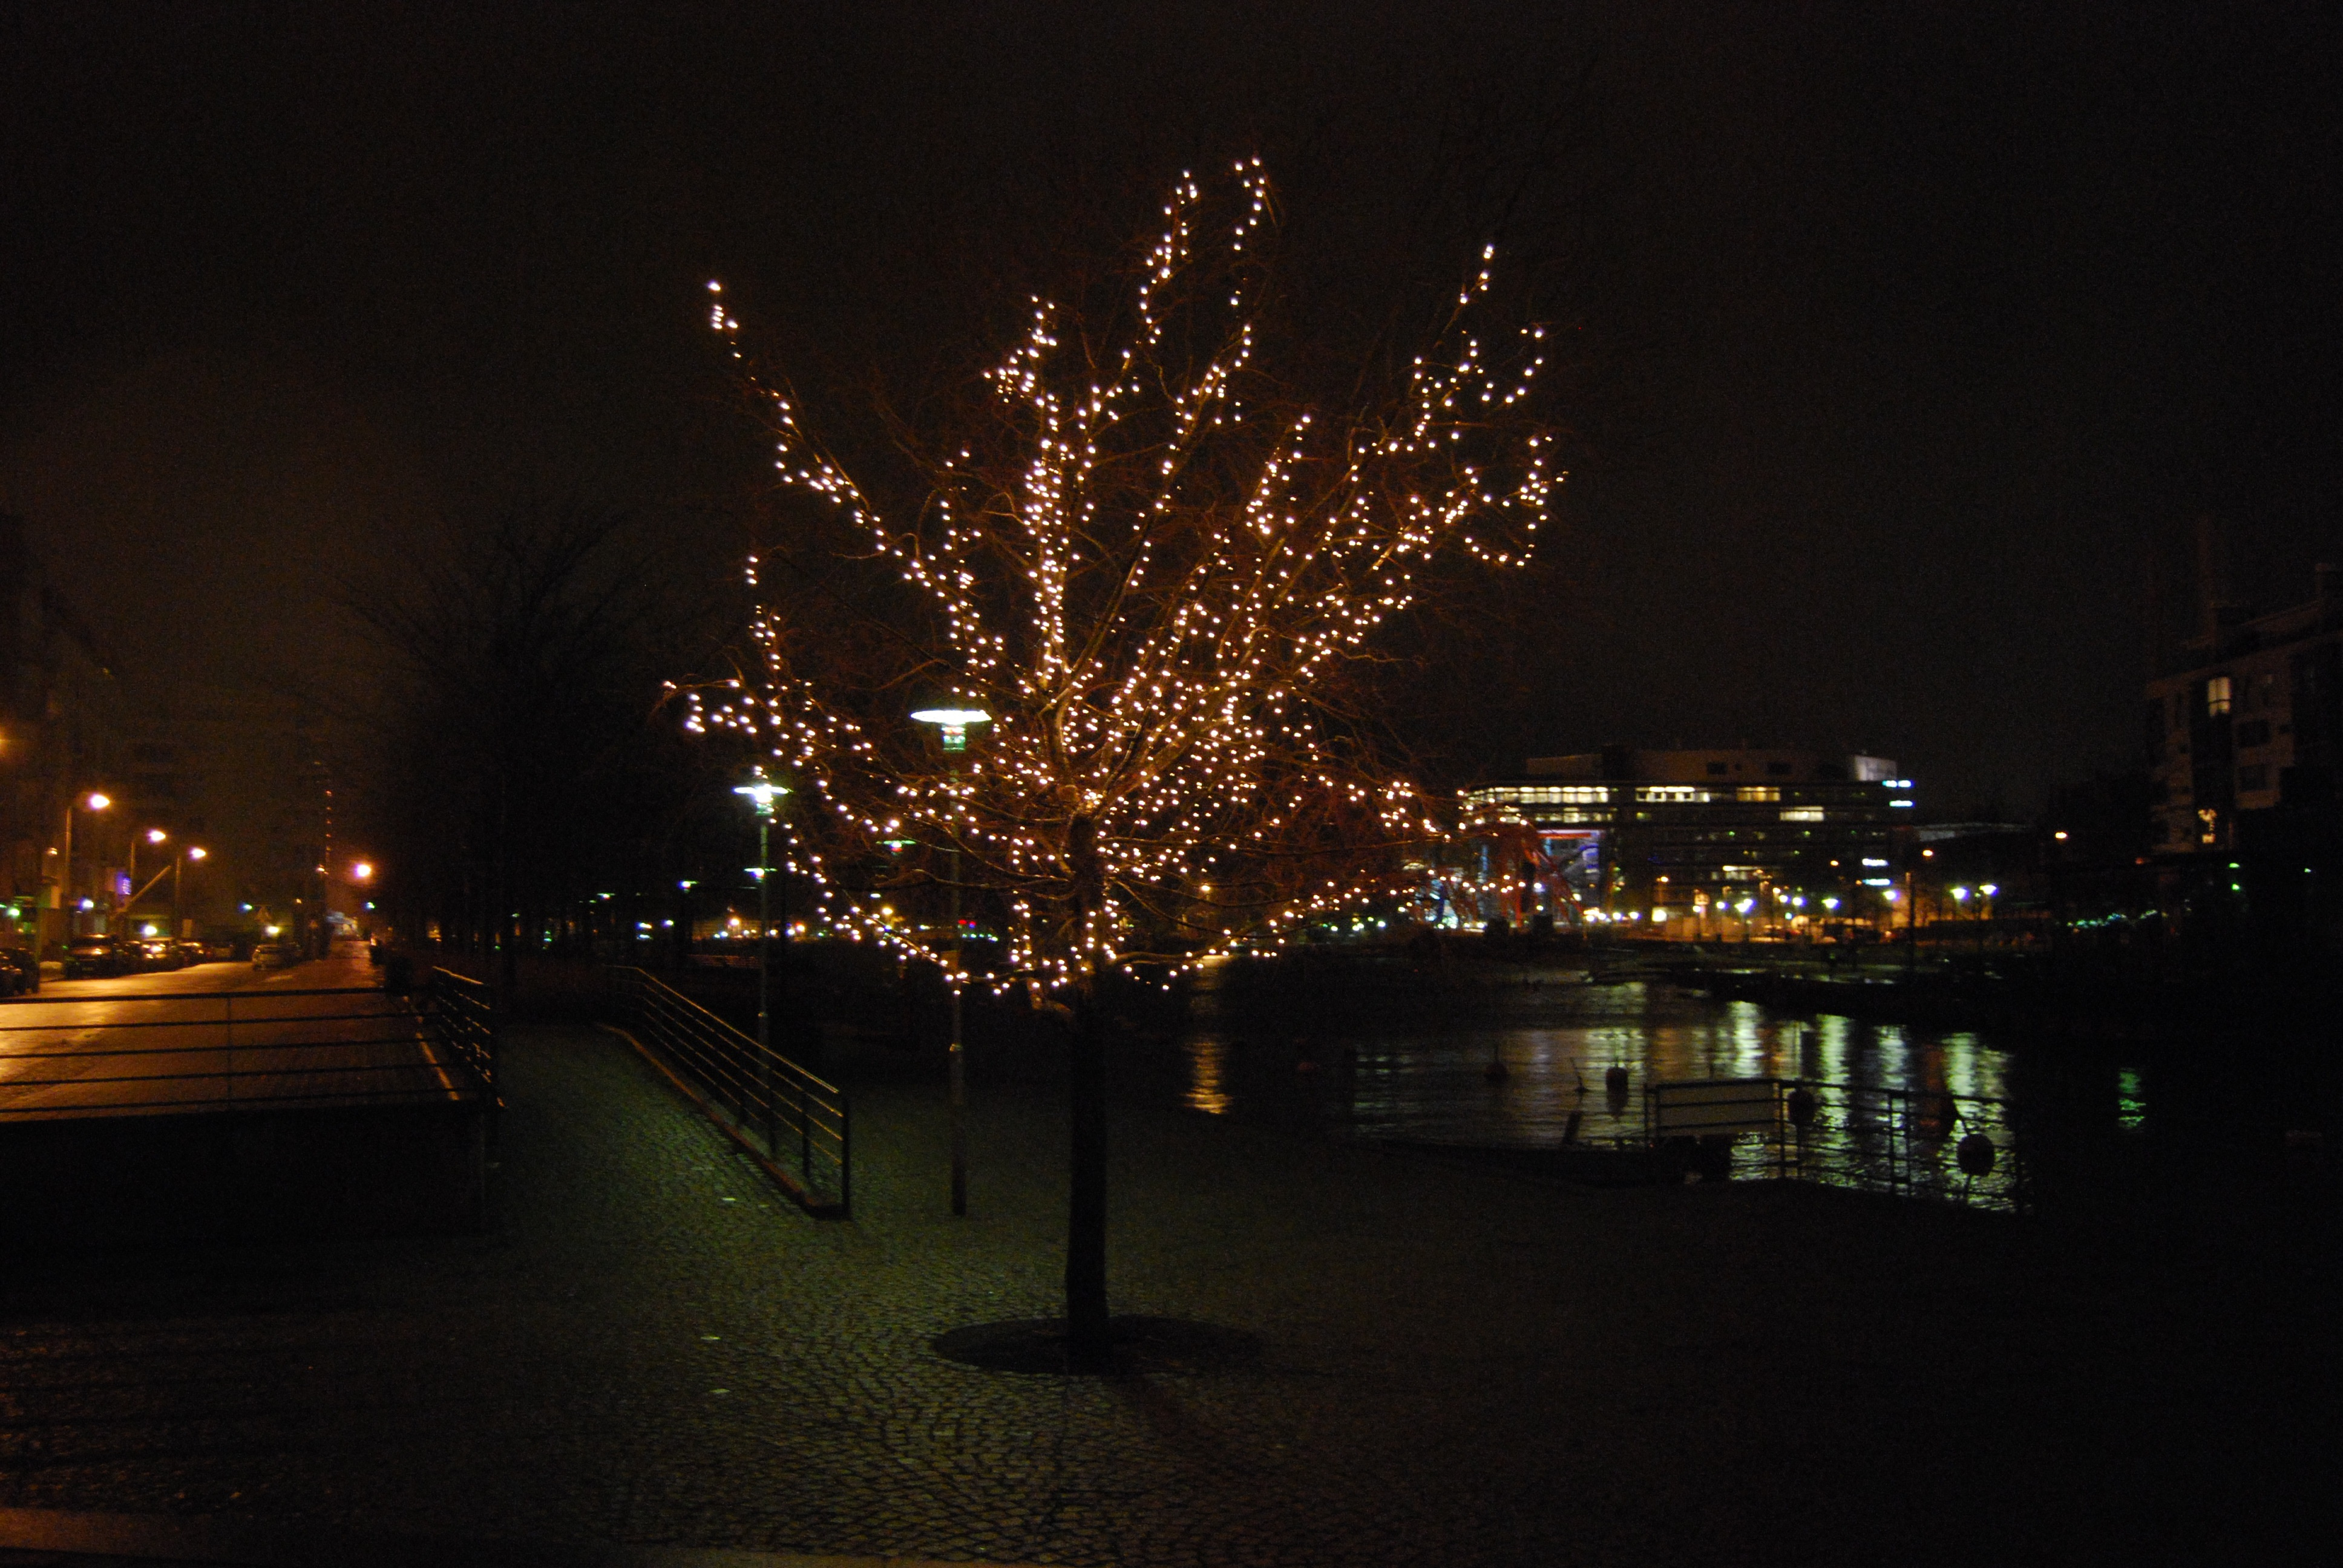 lonelinessandthetree